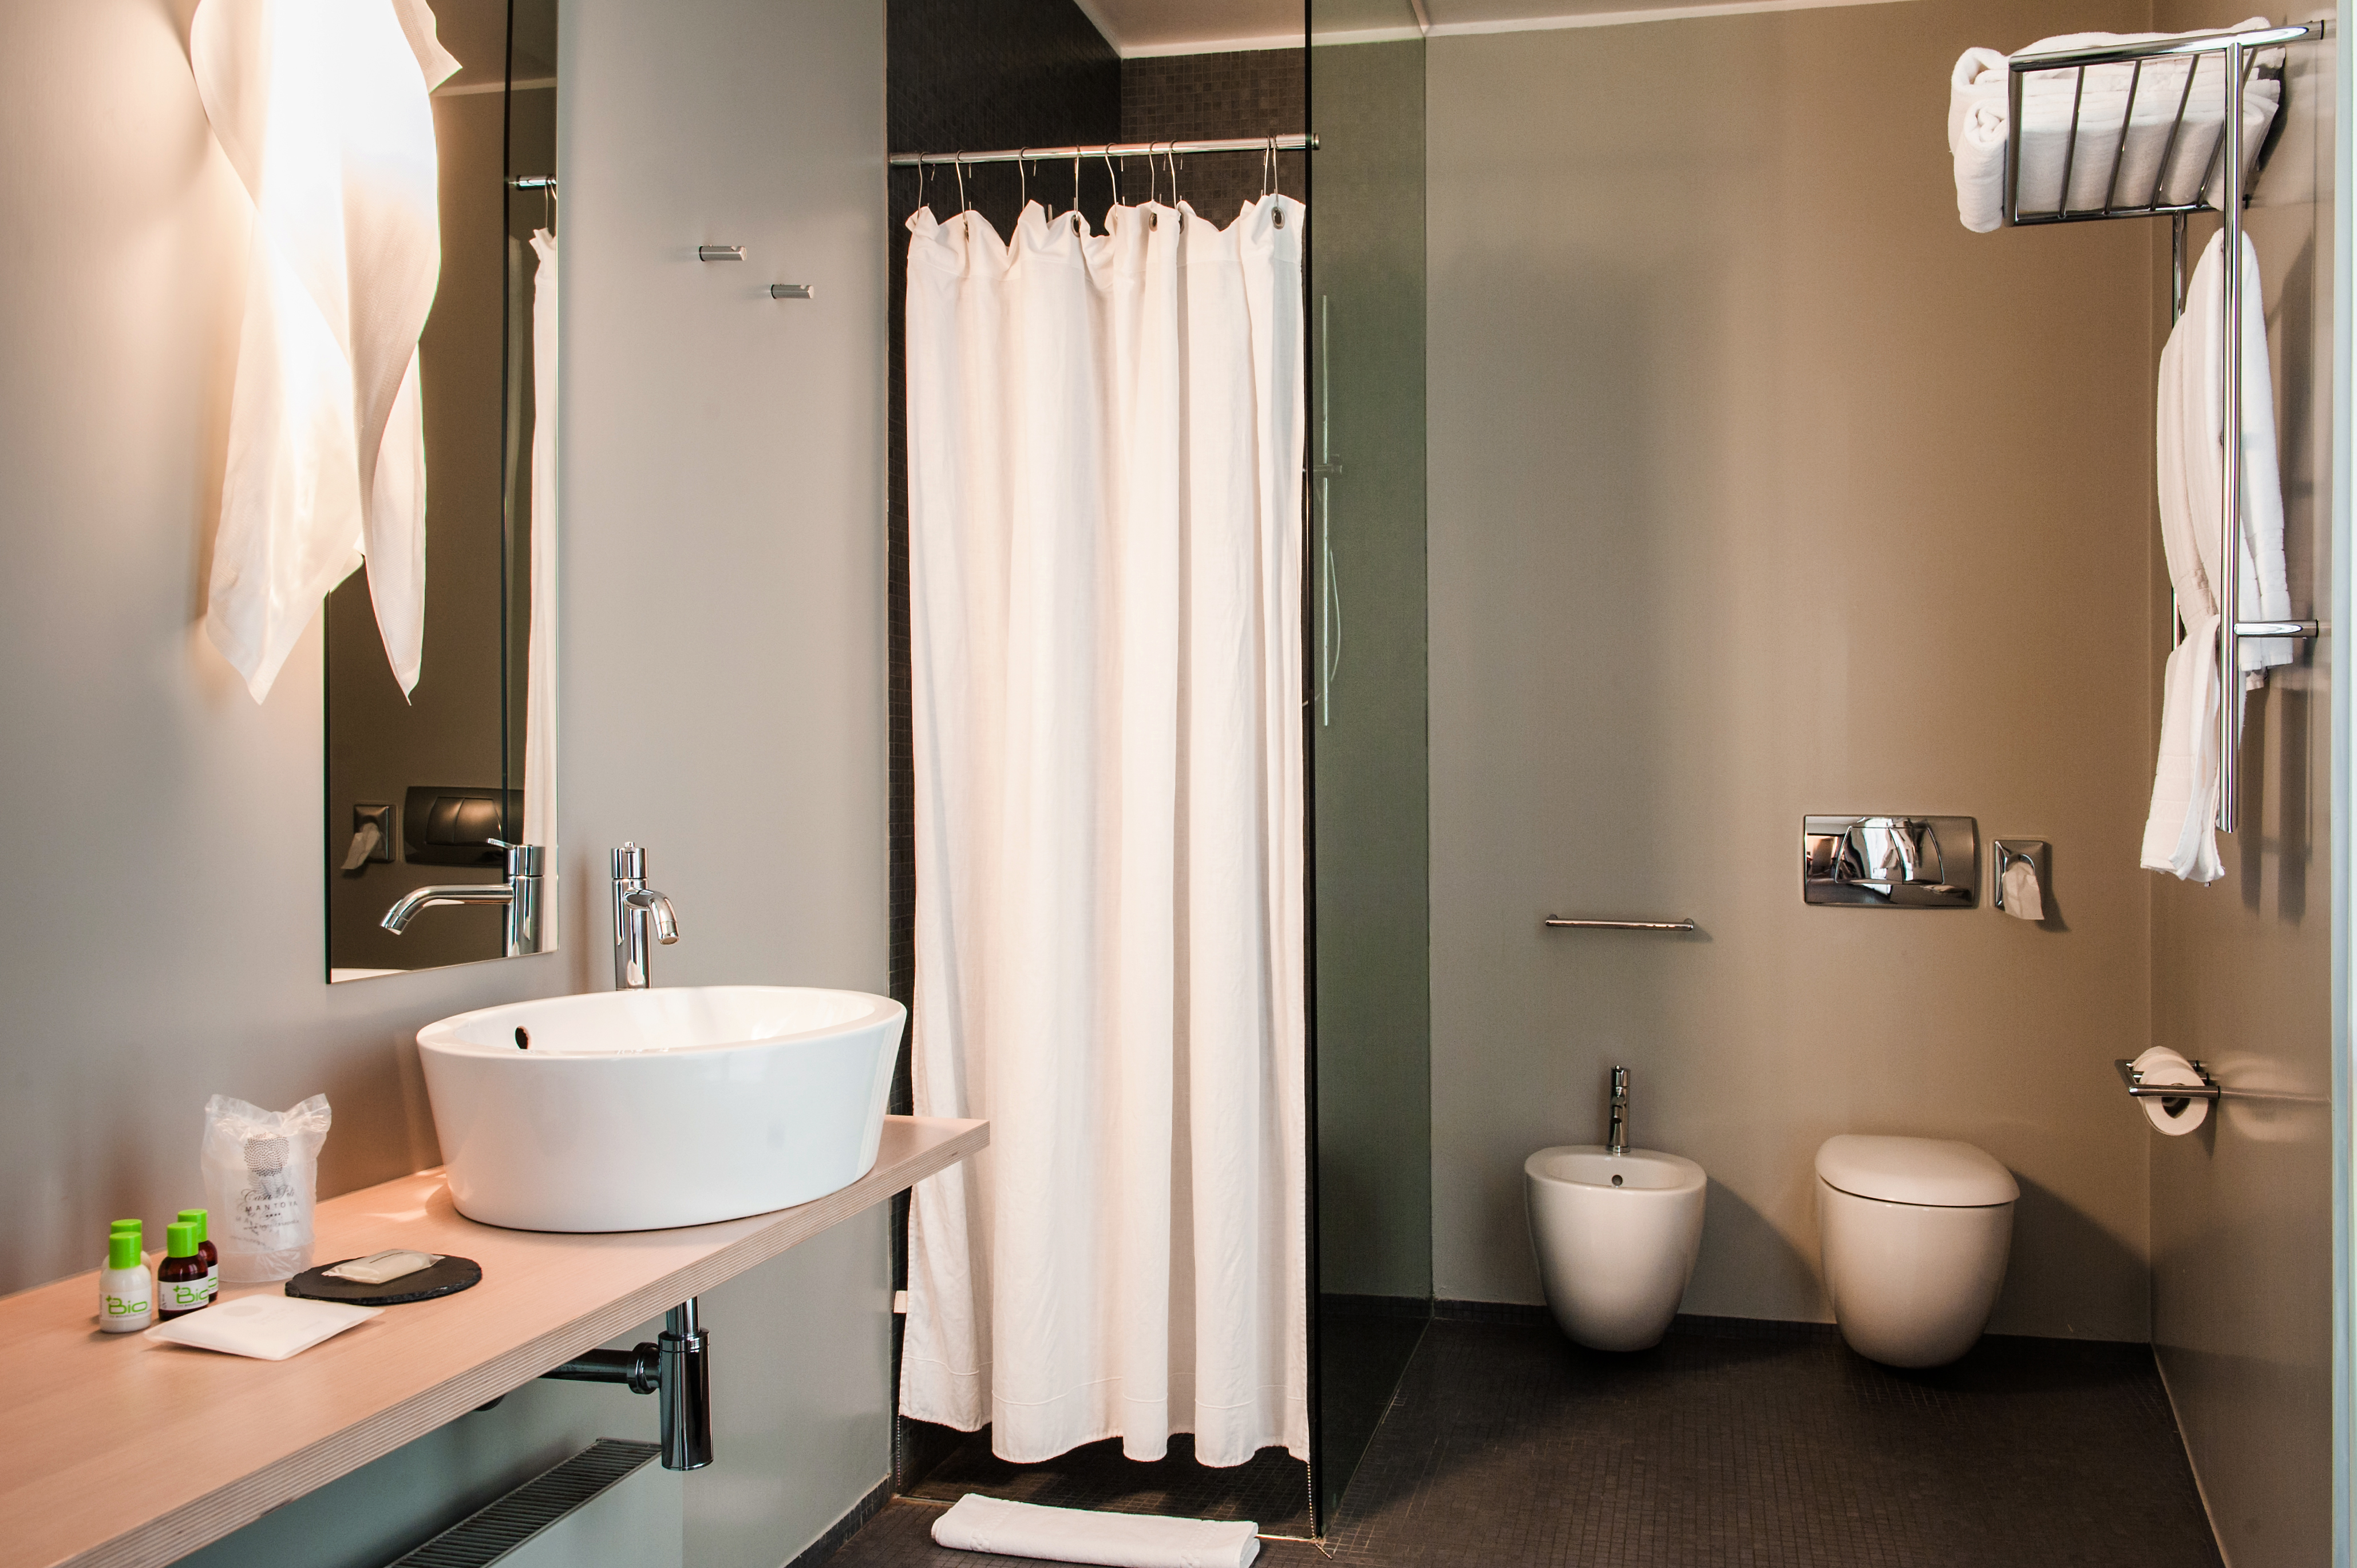 Hotel Casa Poli (Mantova) - 0087